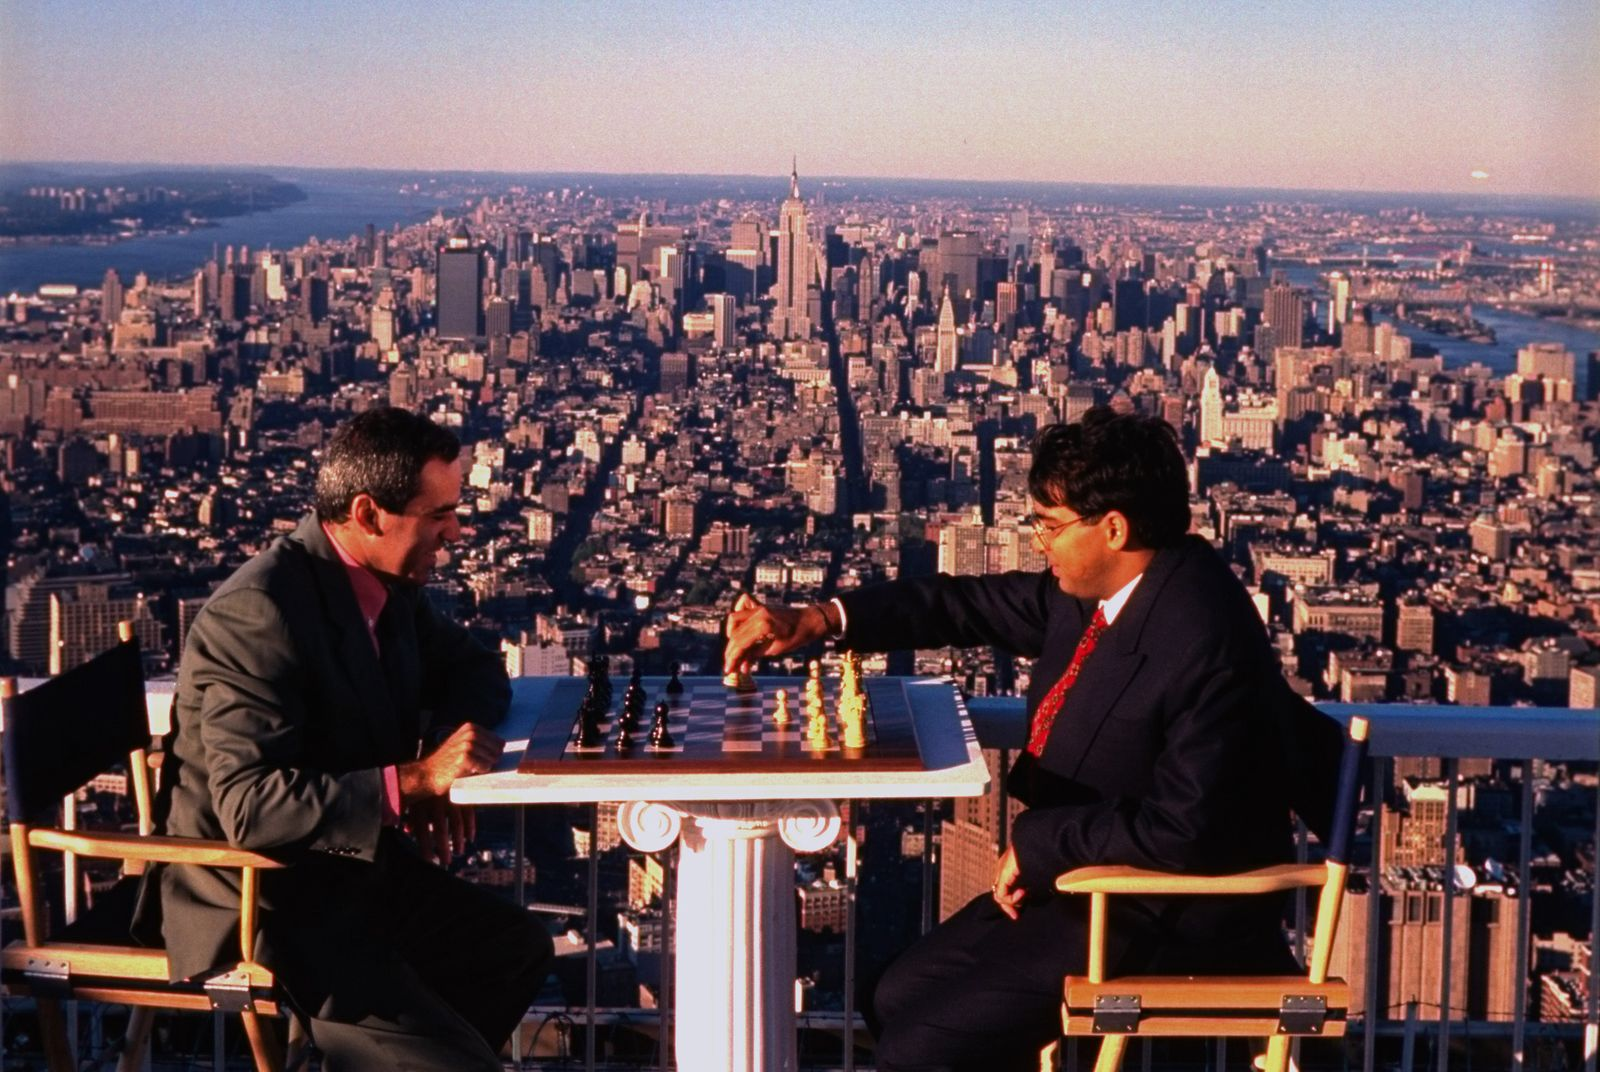 Chess: Garry Kasparov (L, black) in acti